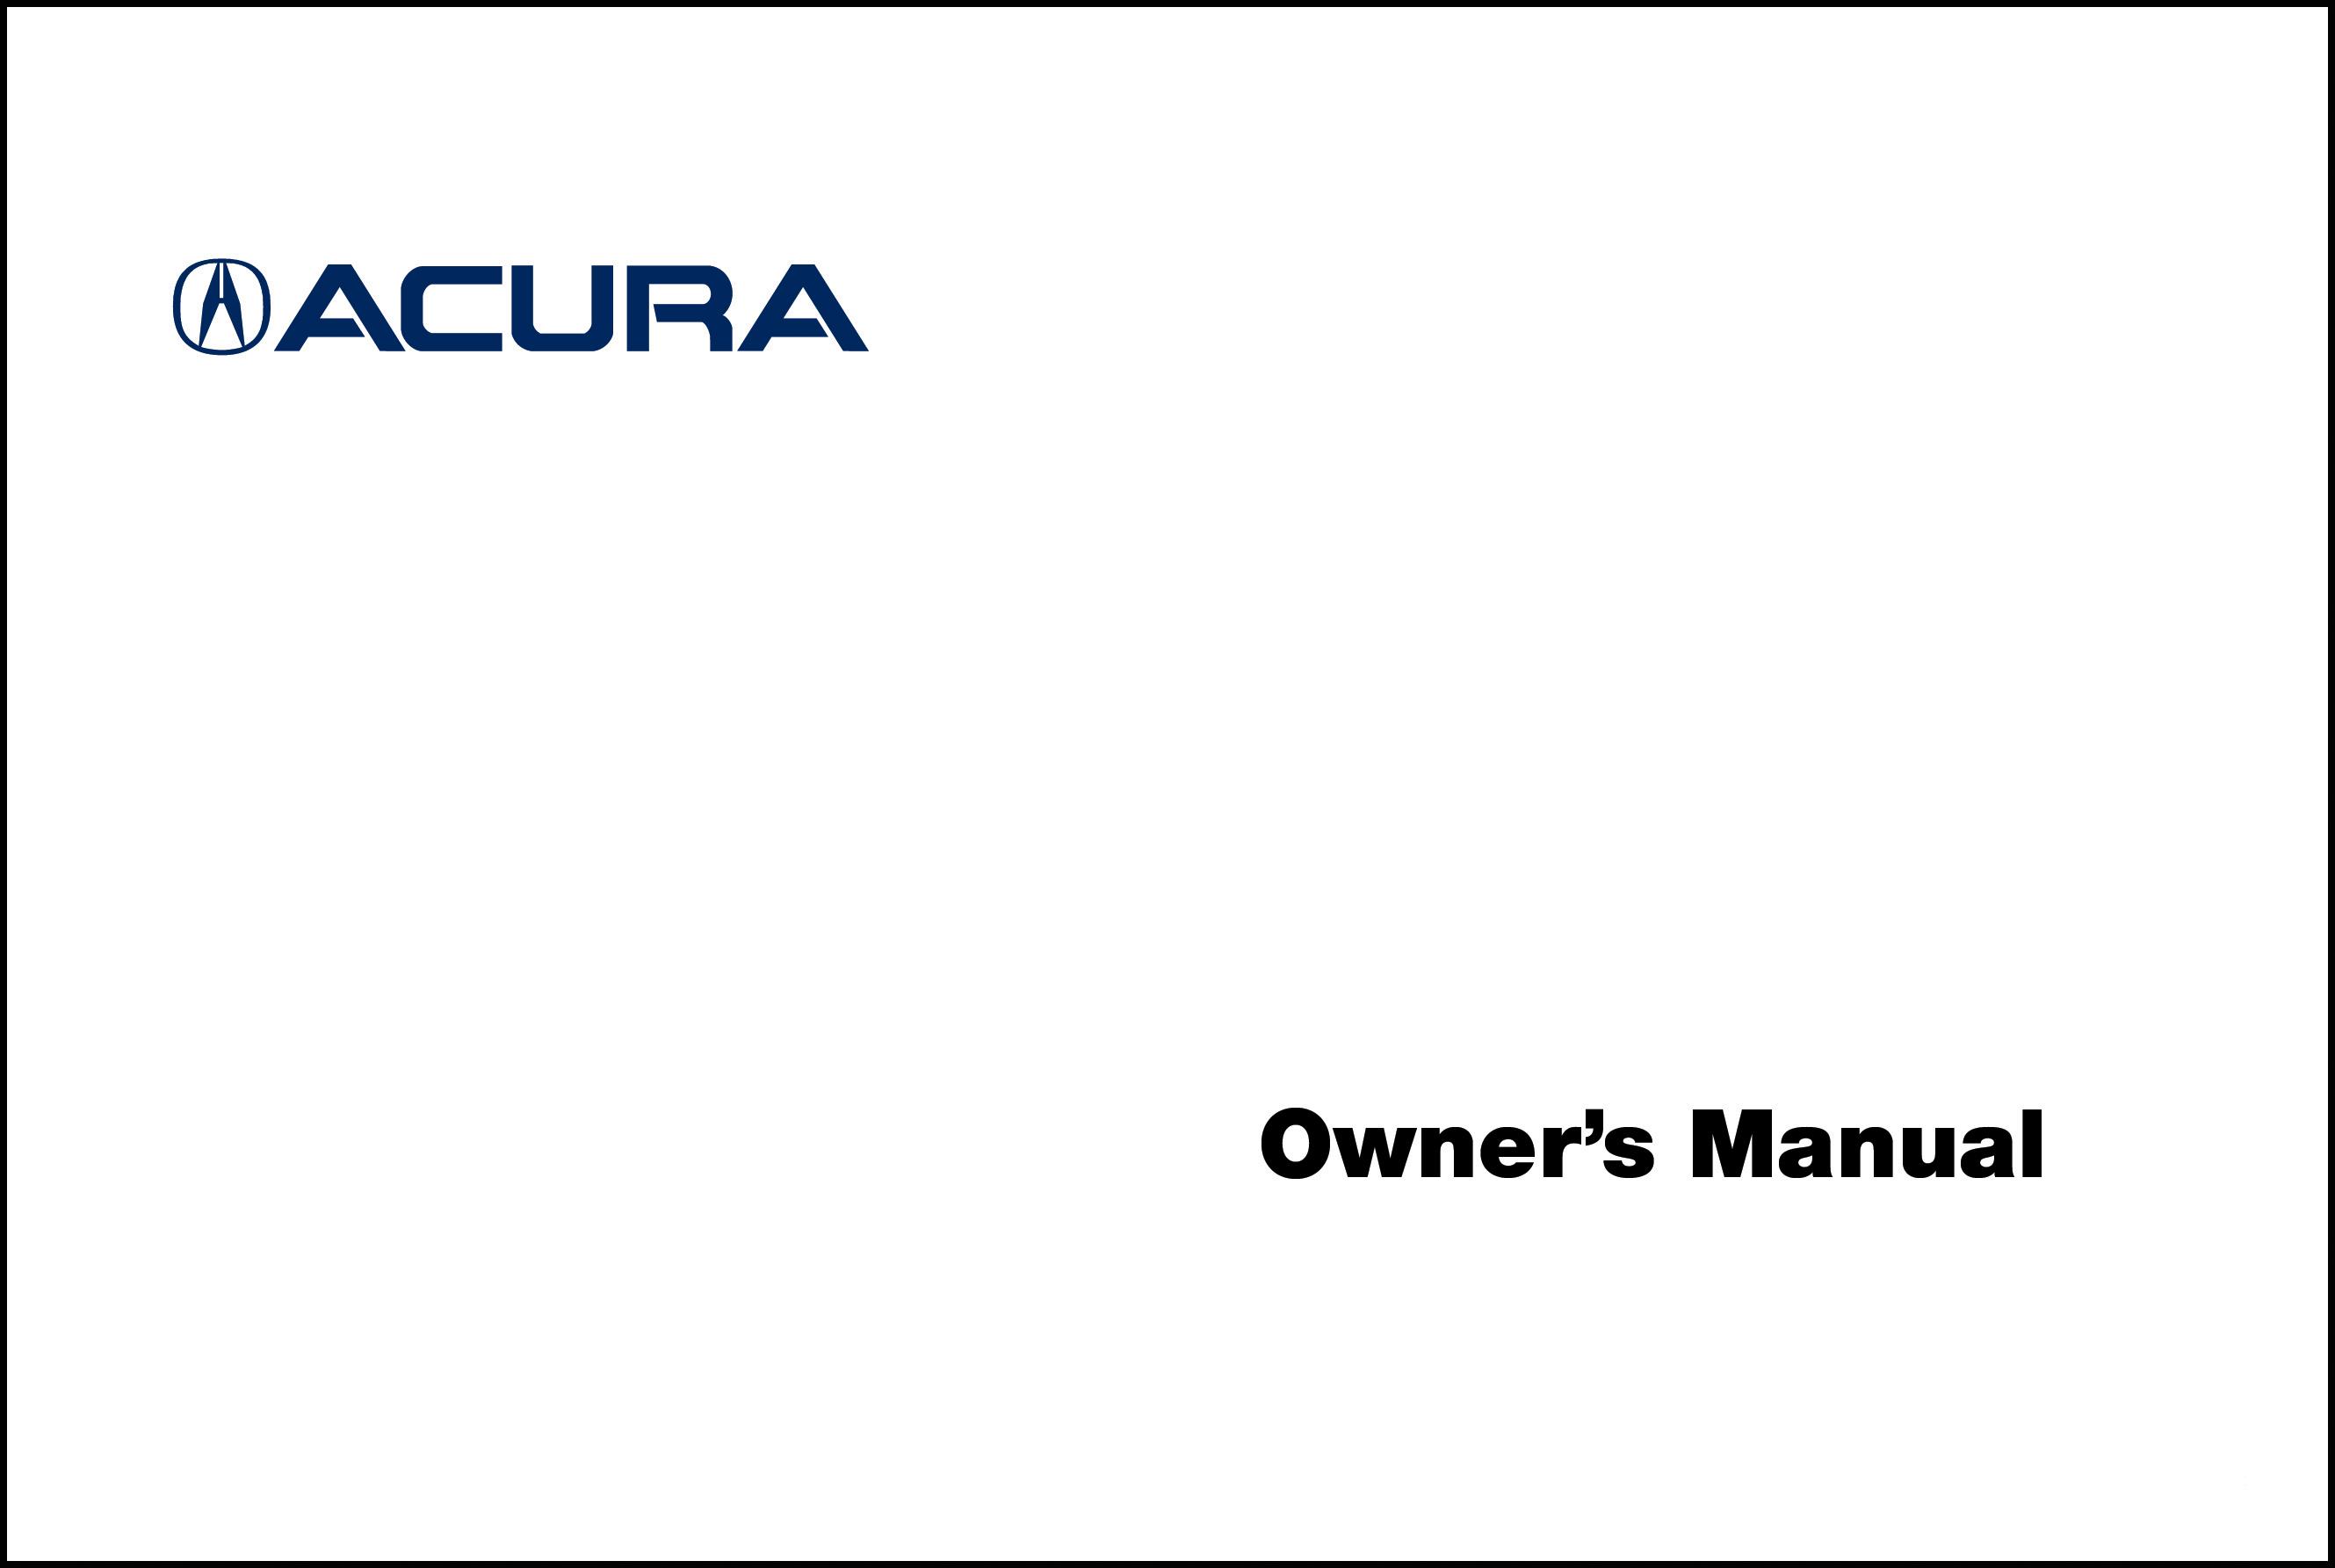 acura 2015 rdx owner manual 15 ebay rh ebay com acura owners manual pdf acura owners manual 2019 rdx